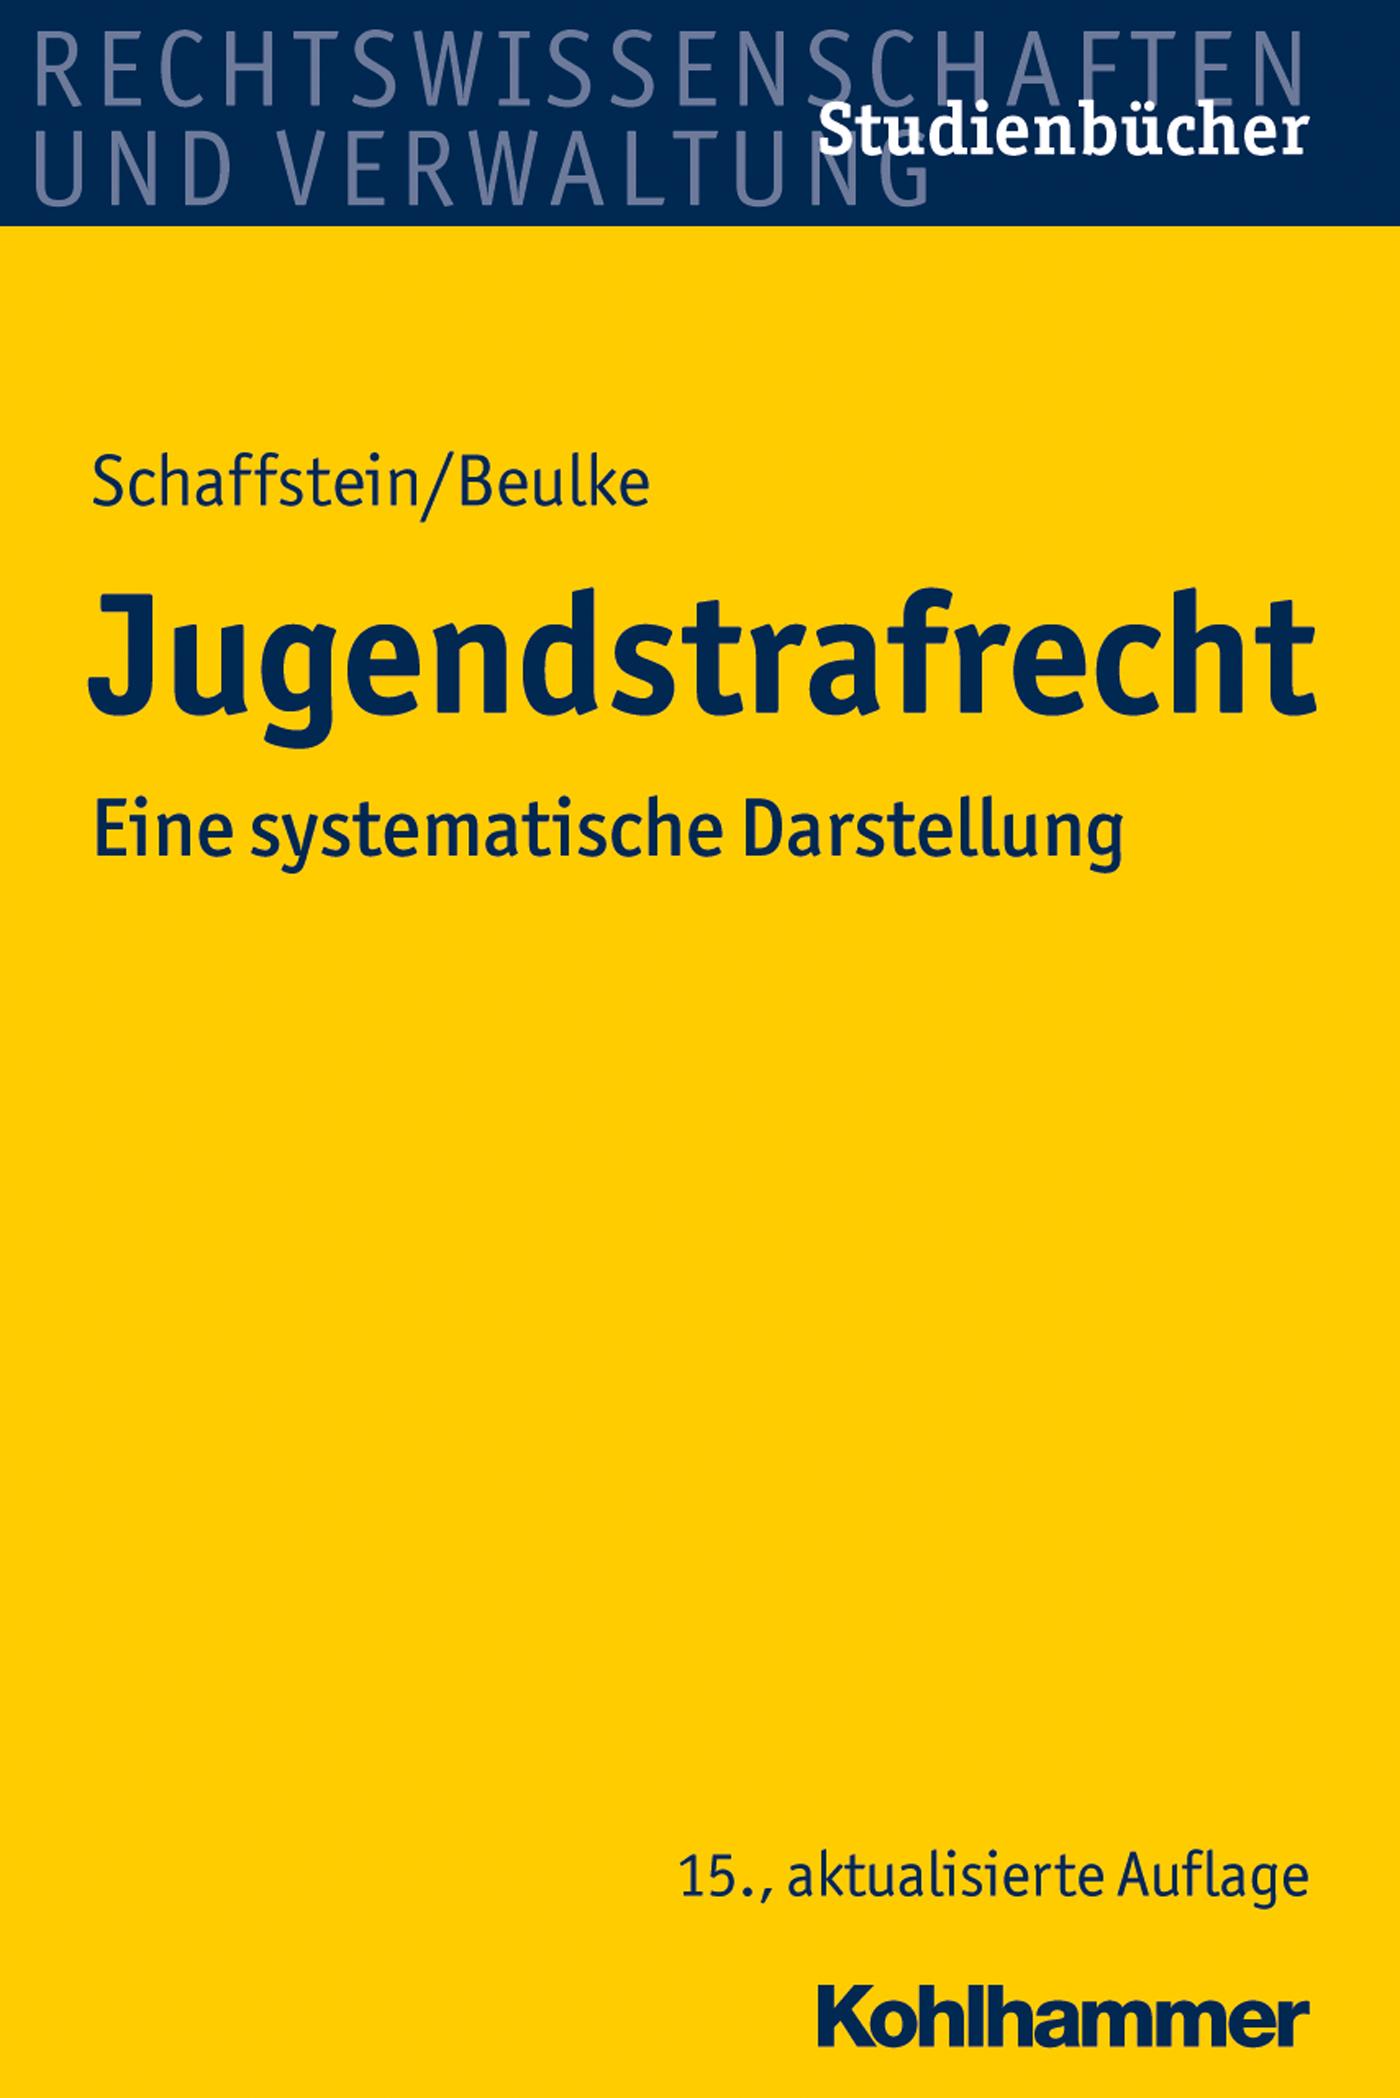 Friedrich Schaffstein Jugendstrafrecht klaus laubenthal fallsammlung zu kriminologie jugendstrafrecht strafvollzug